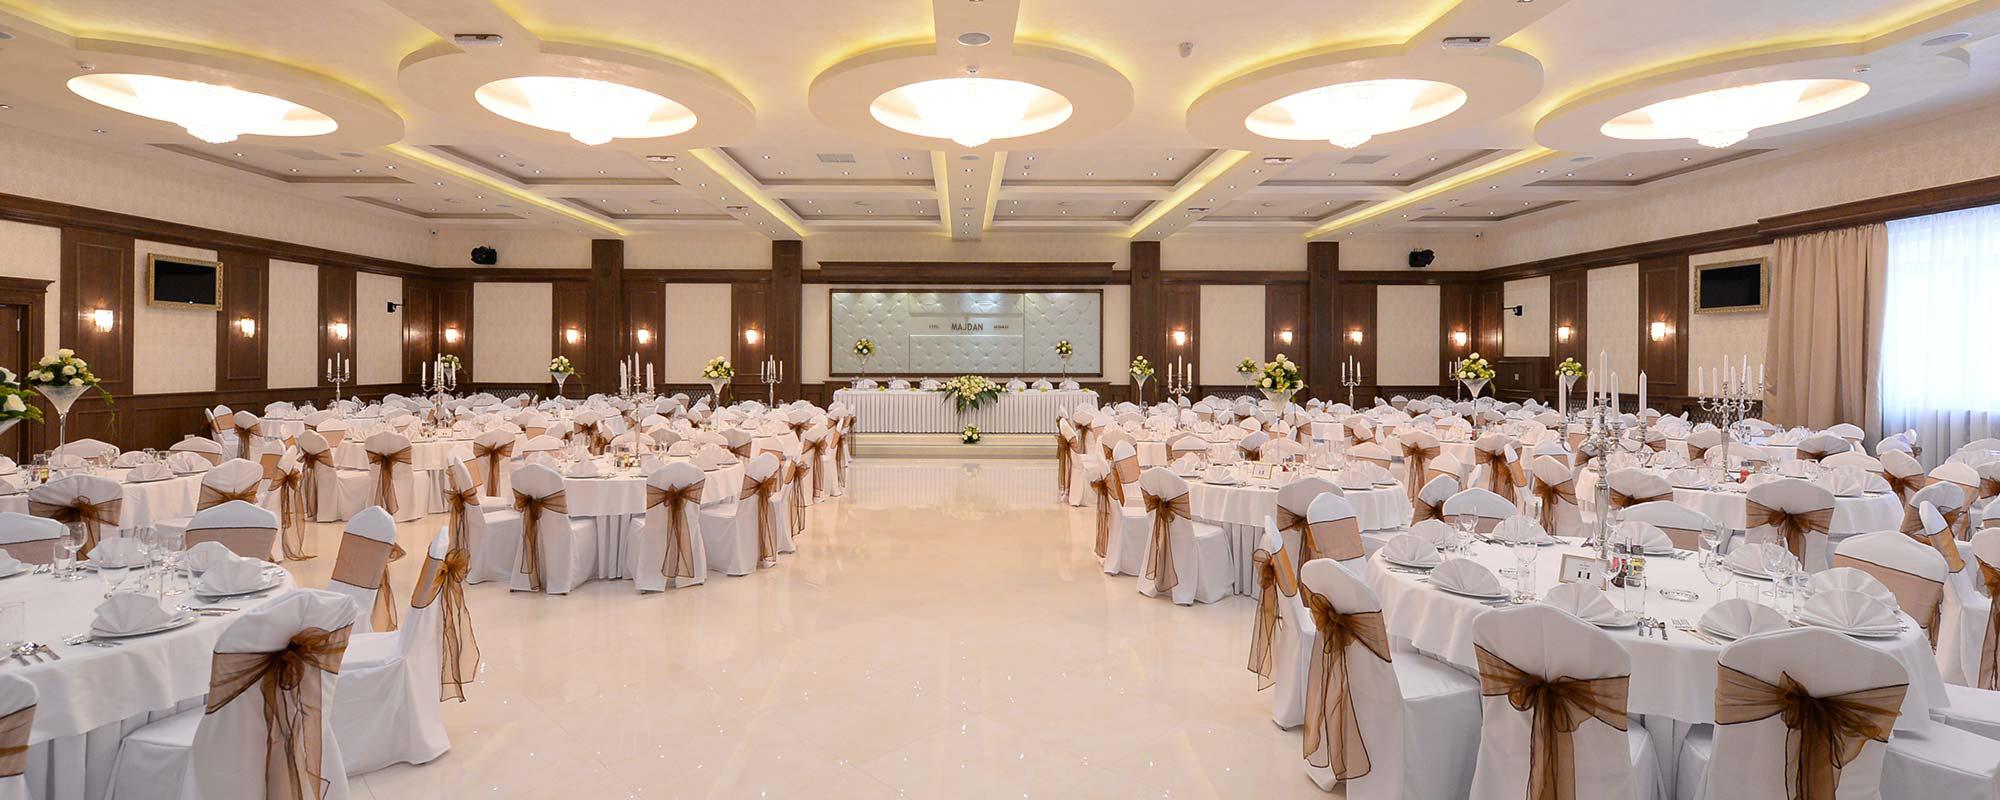 Luksuzni Majdan Event Centar